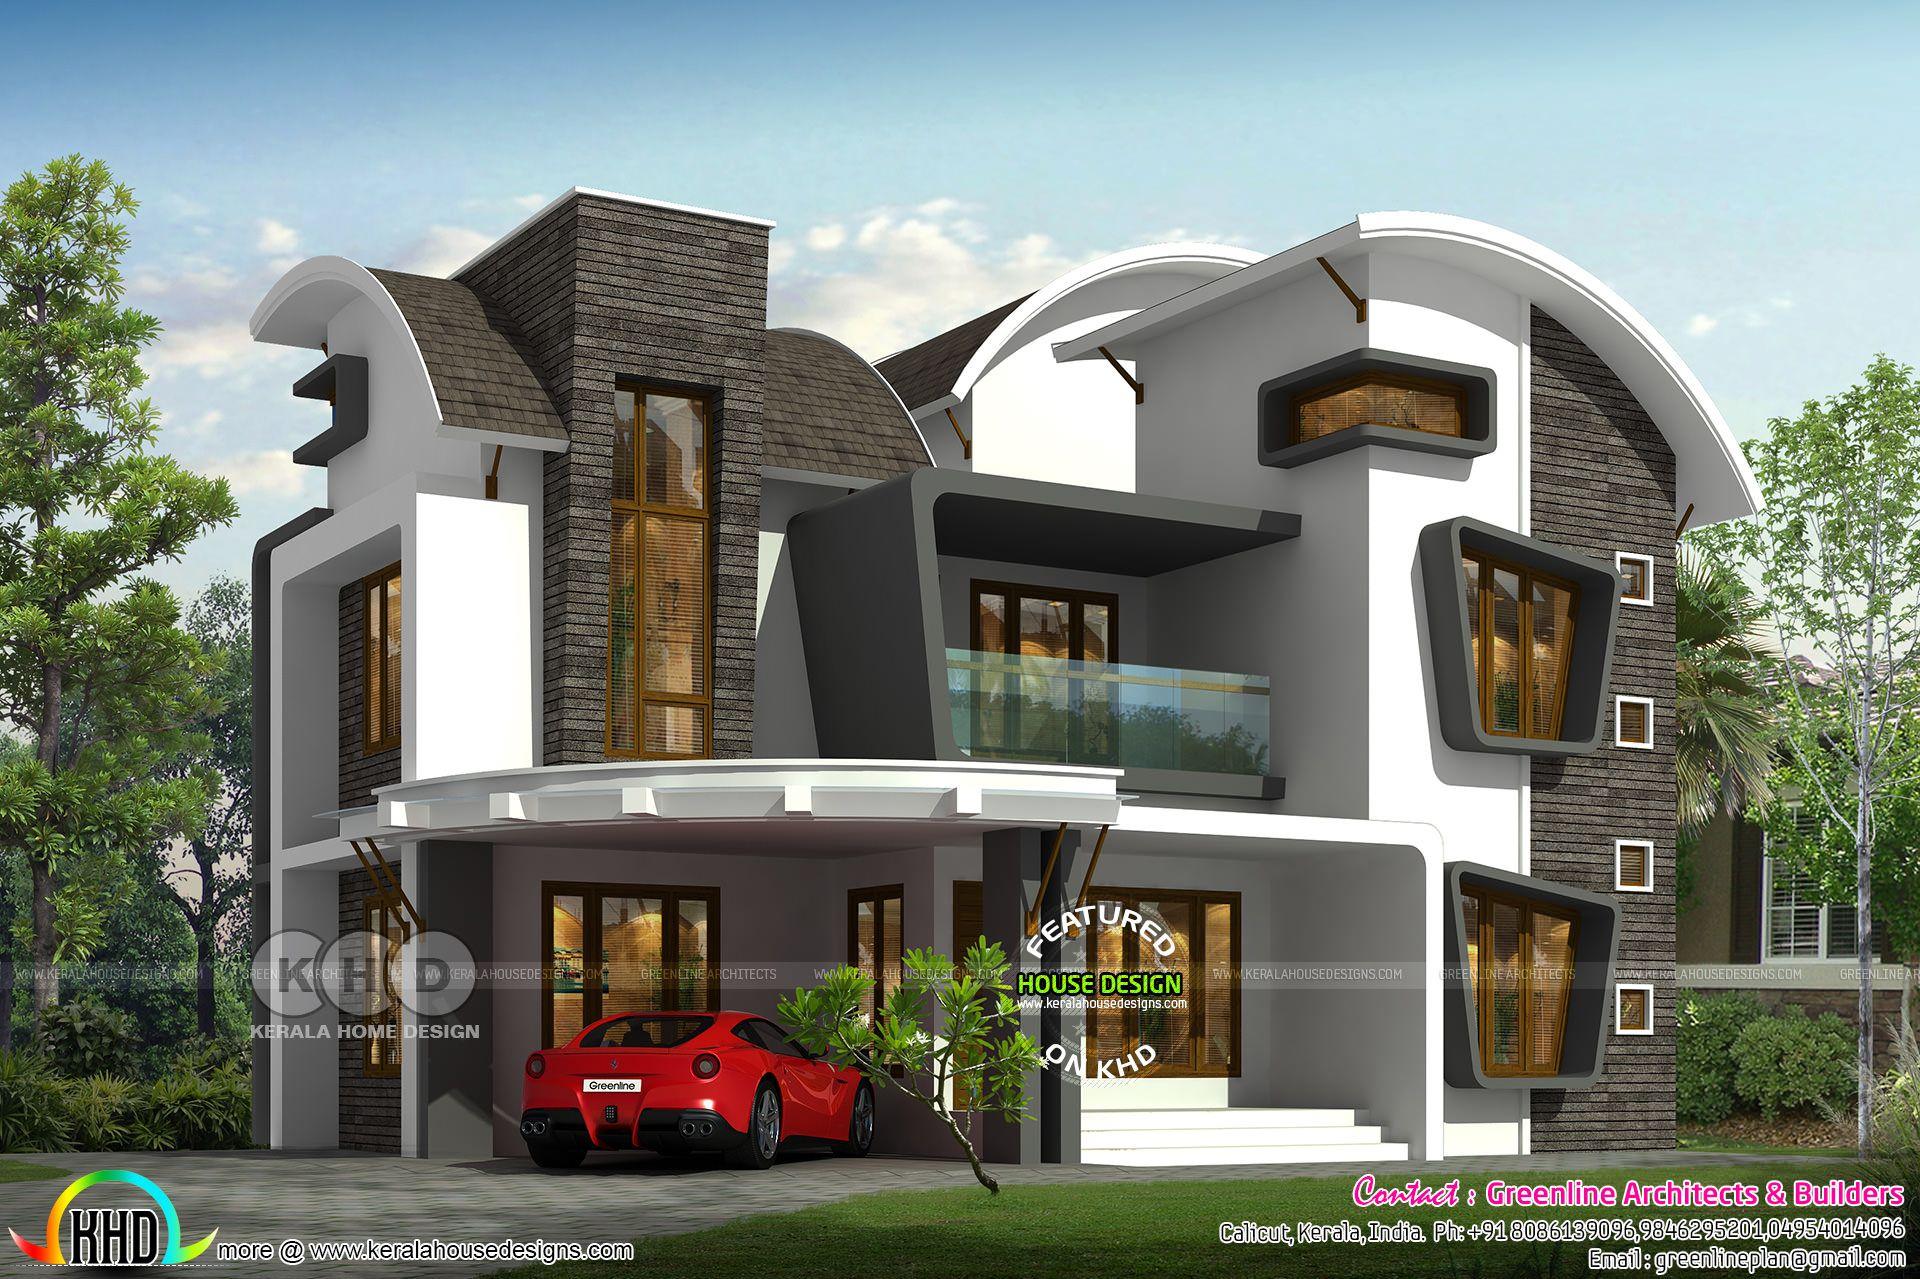 Unique Curvy Roof 4 Bedroom House Rendering Home Building Design Bungalow House Design Kerala House Design